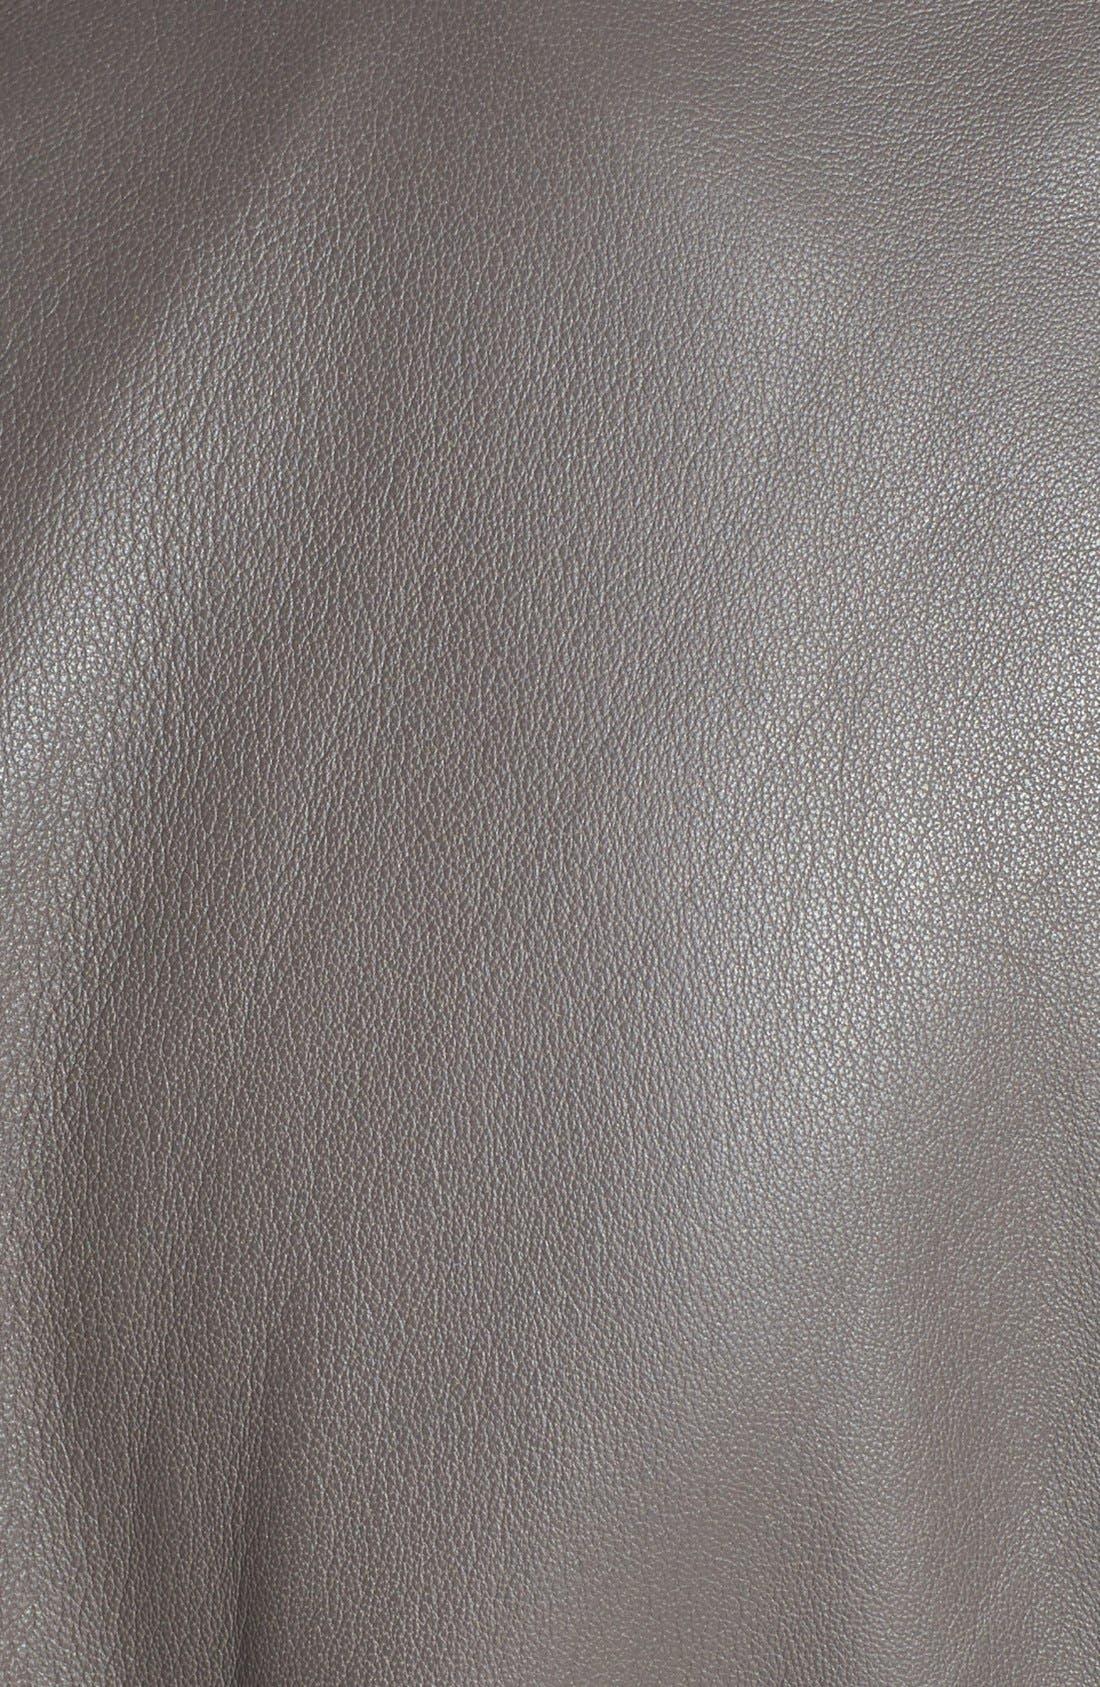 Alternate Image 3  - Trouvé Collarless Leather Jacket